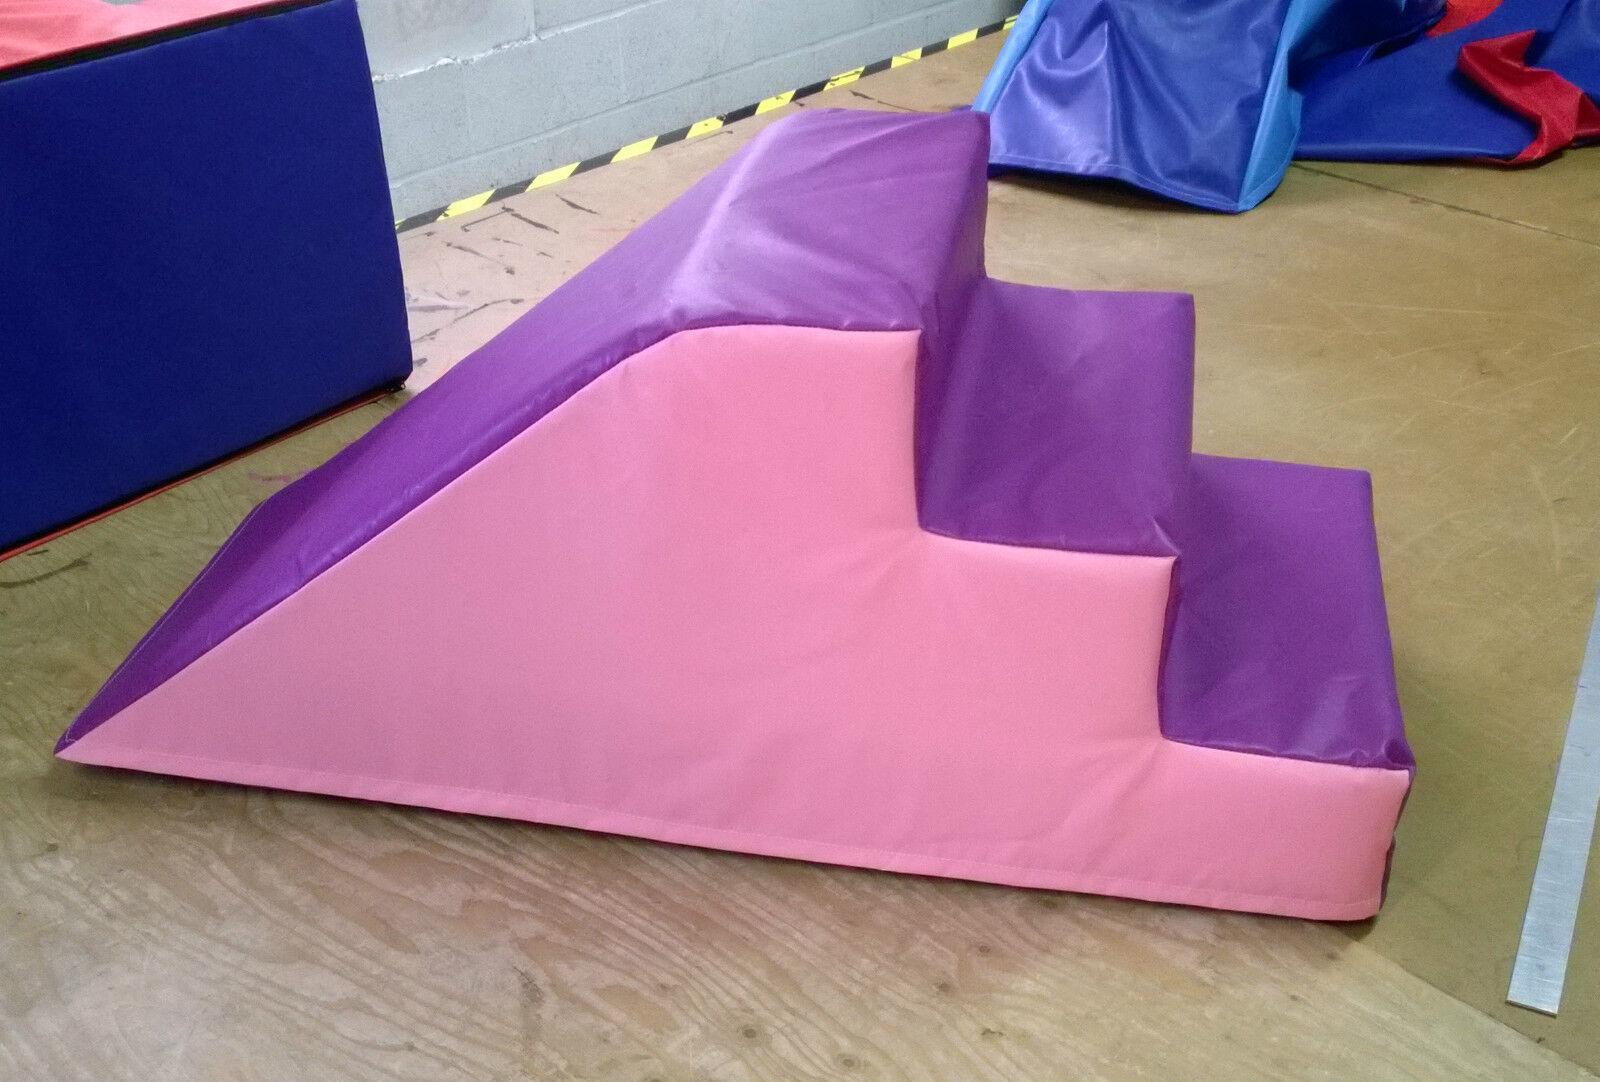 Light Pink / Purple  Soft Play Step & Slide  120cm x 50cm x 50cm